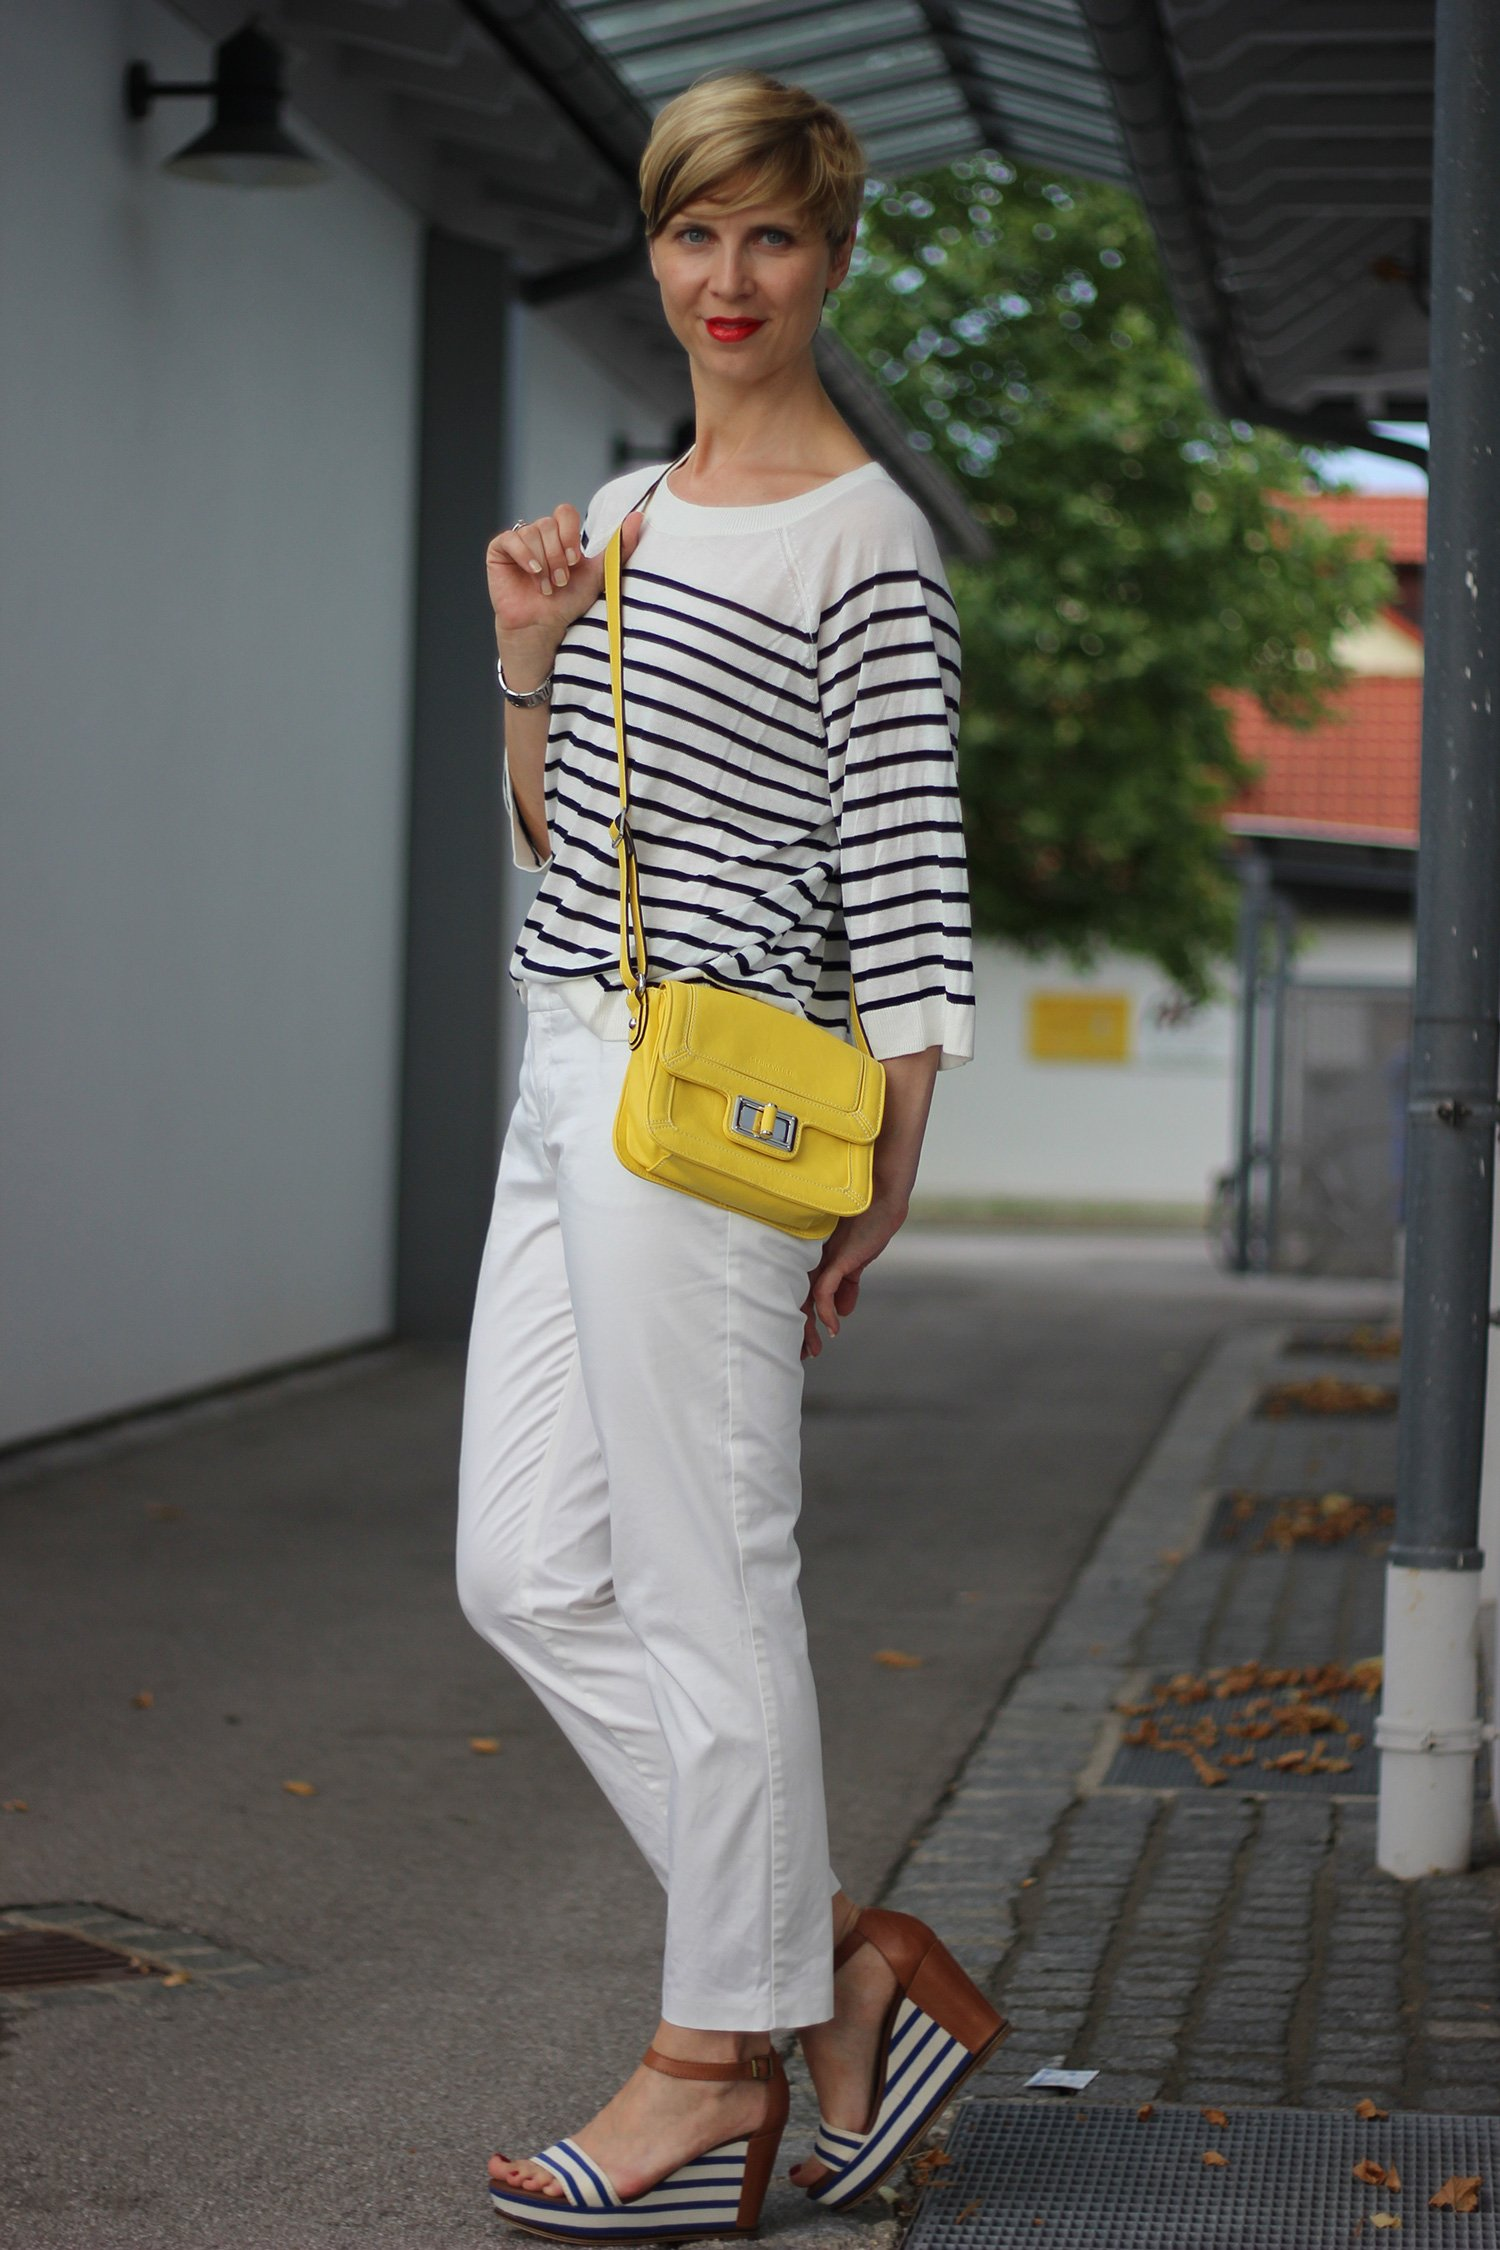 IMG_8259a_OUI_hose_weisse_weiß_white_Streifen_stripes_blue_white_Marcopolo_H&M_Shirt